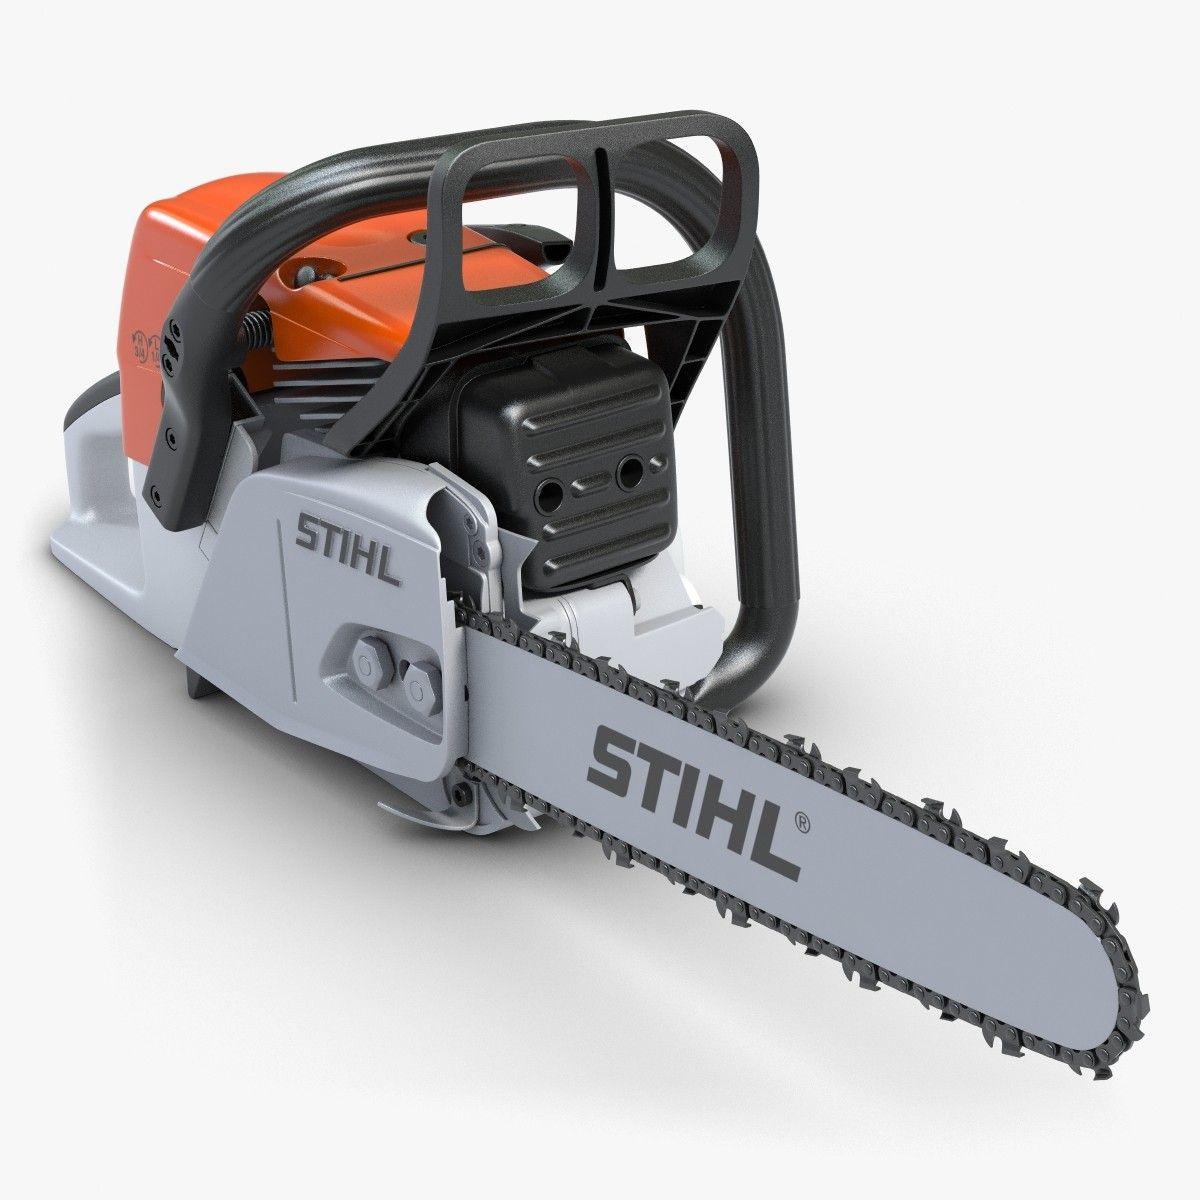 Chainsaw Stihl 1 Chain 3d Max 3d Model Chainsaw Stihl Stihl